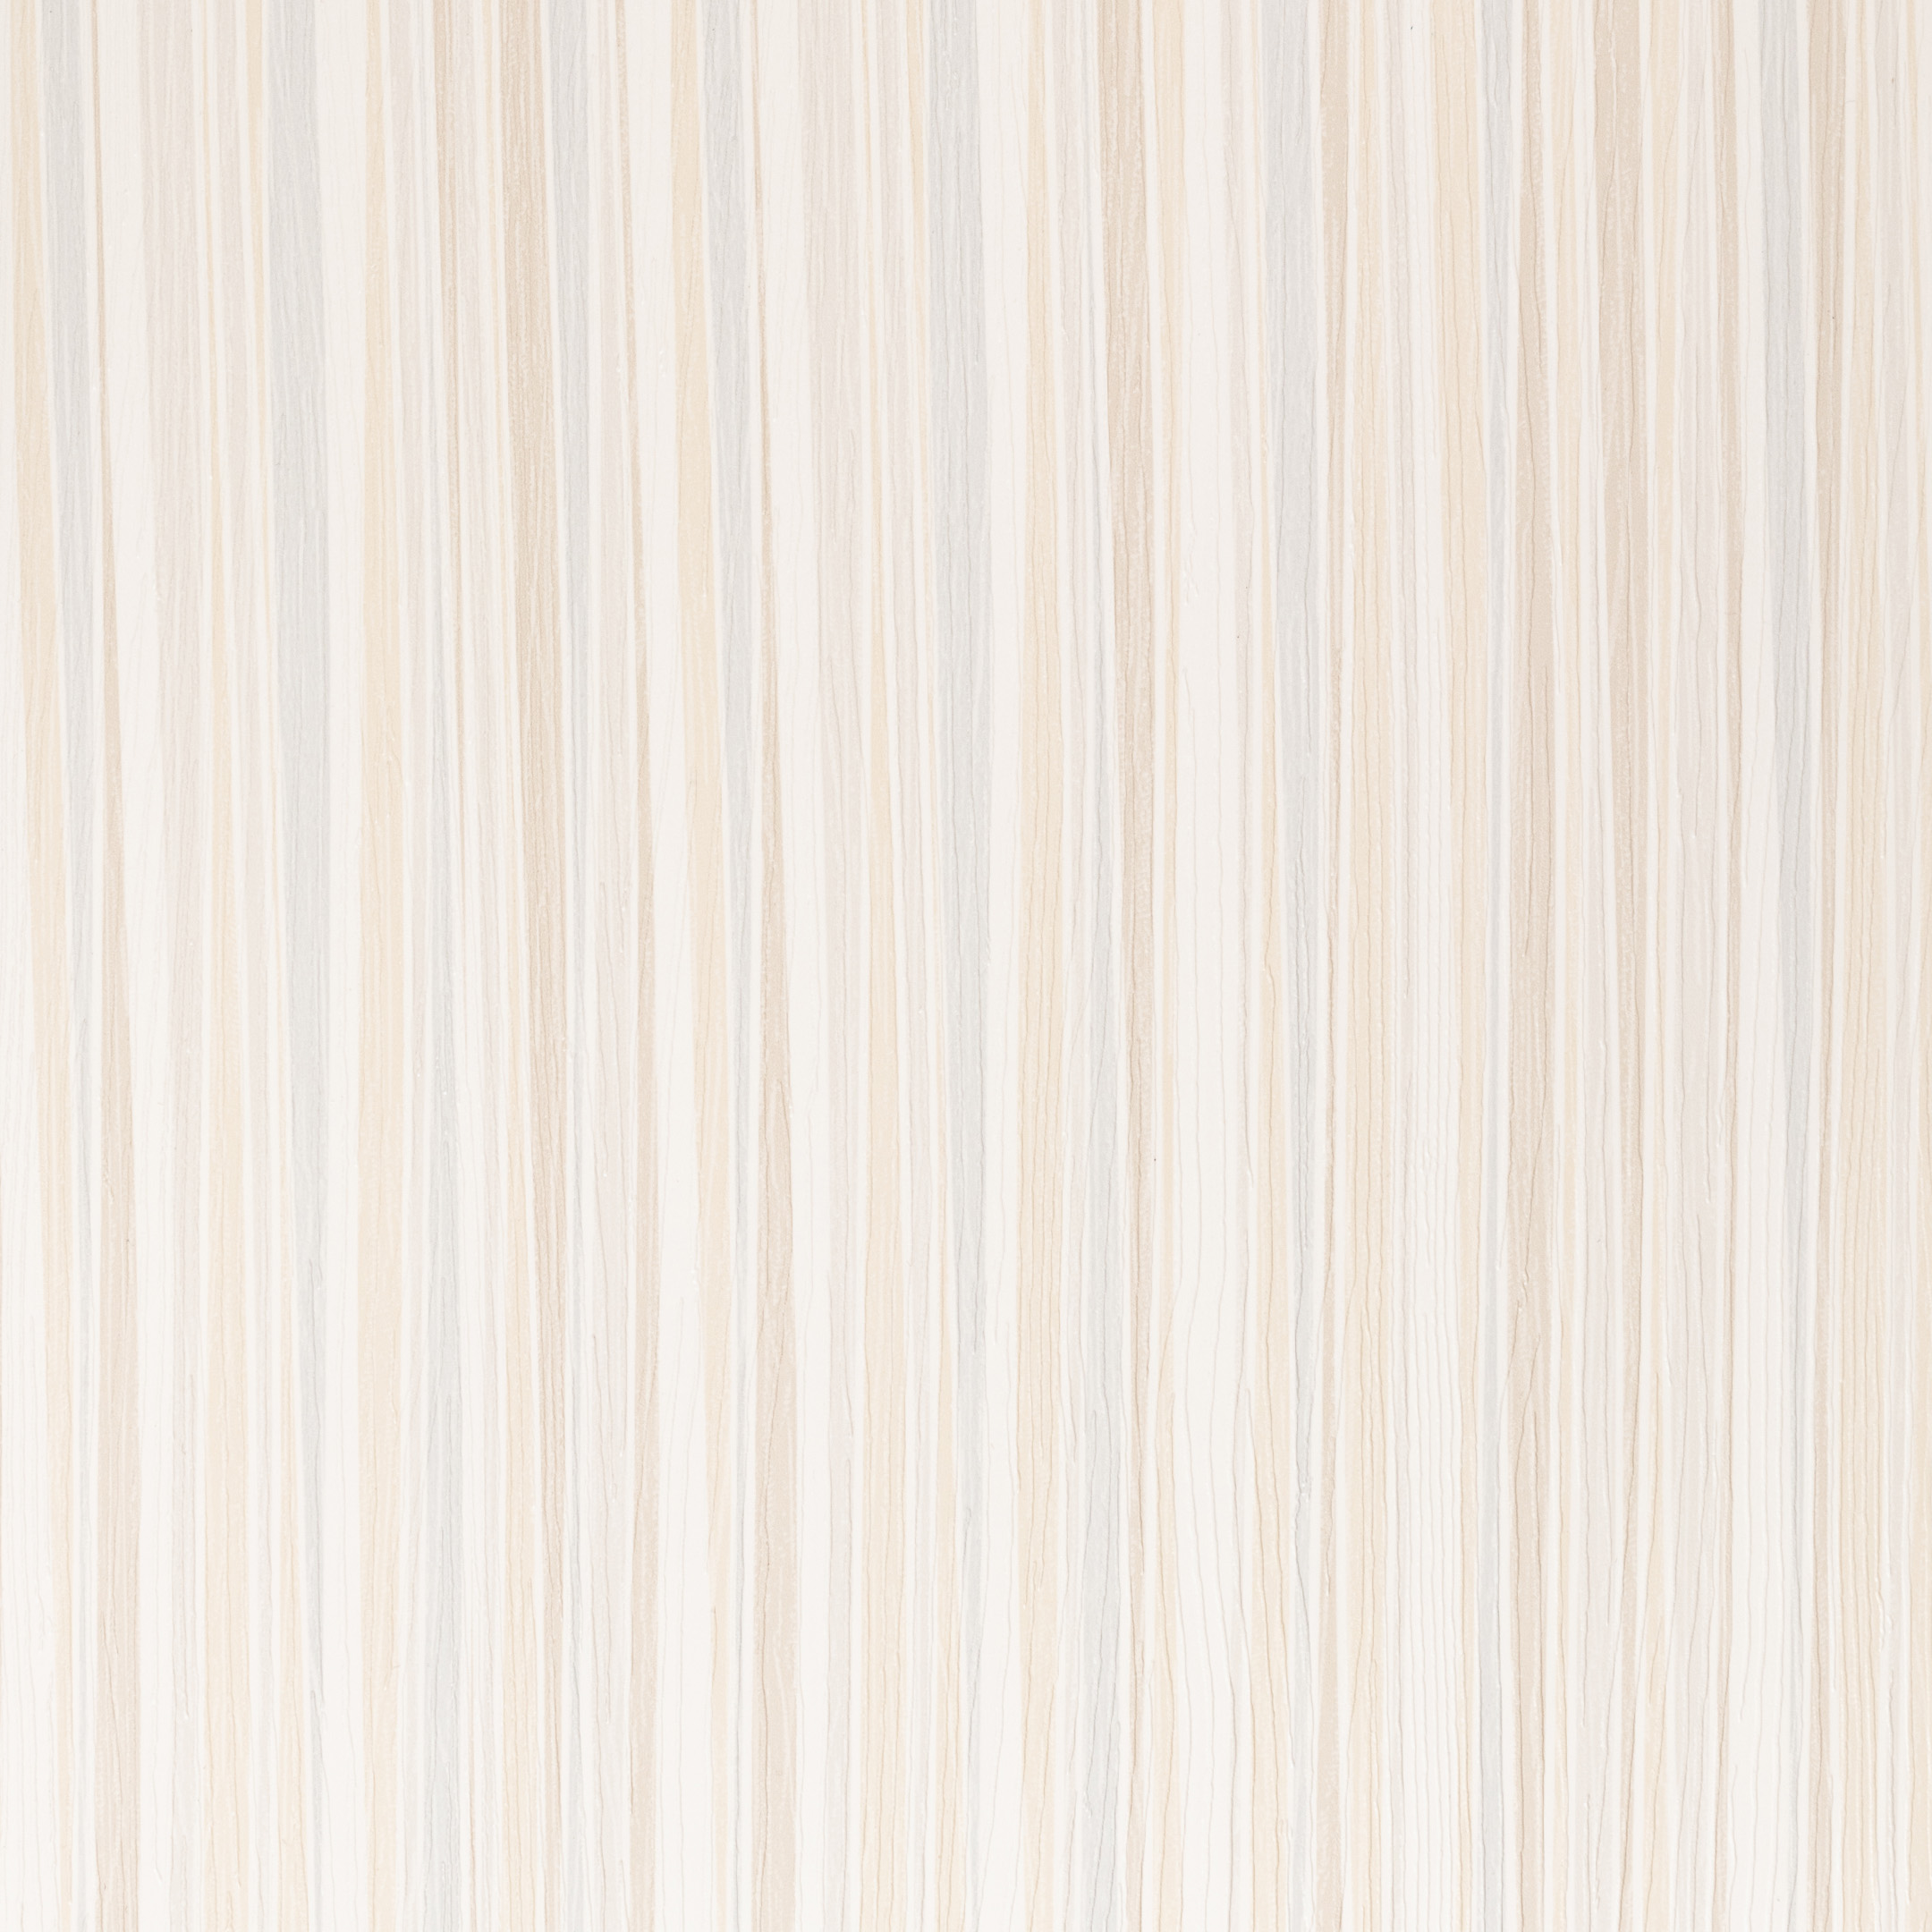 Панель ПВХ 250х2700х8 мм Nordside бесшовная сатин бежевый ламинированная фото